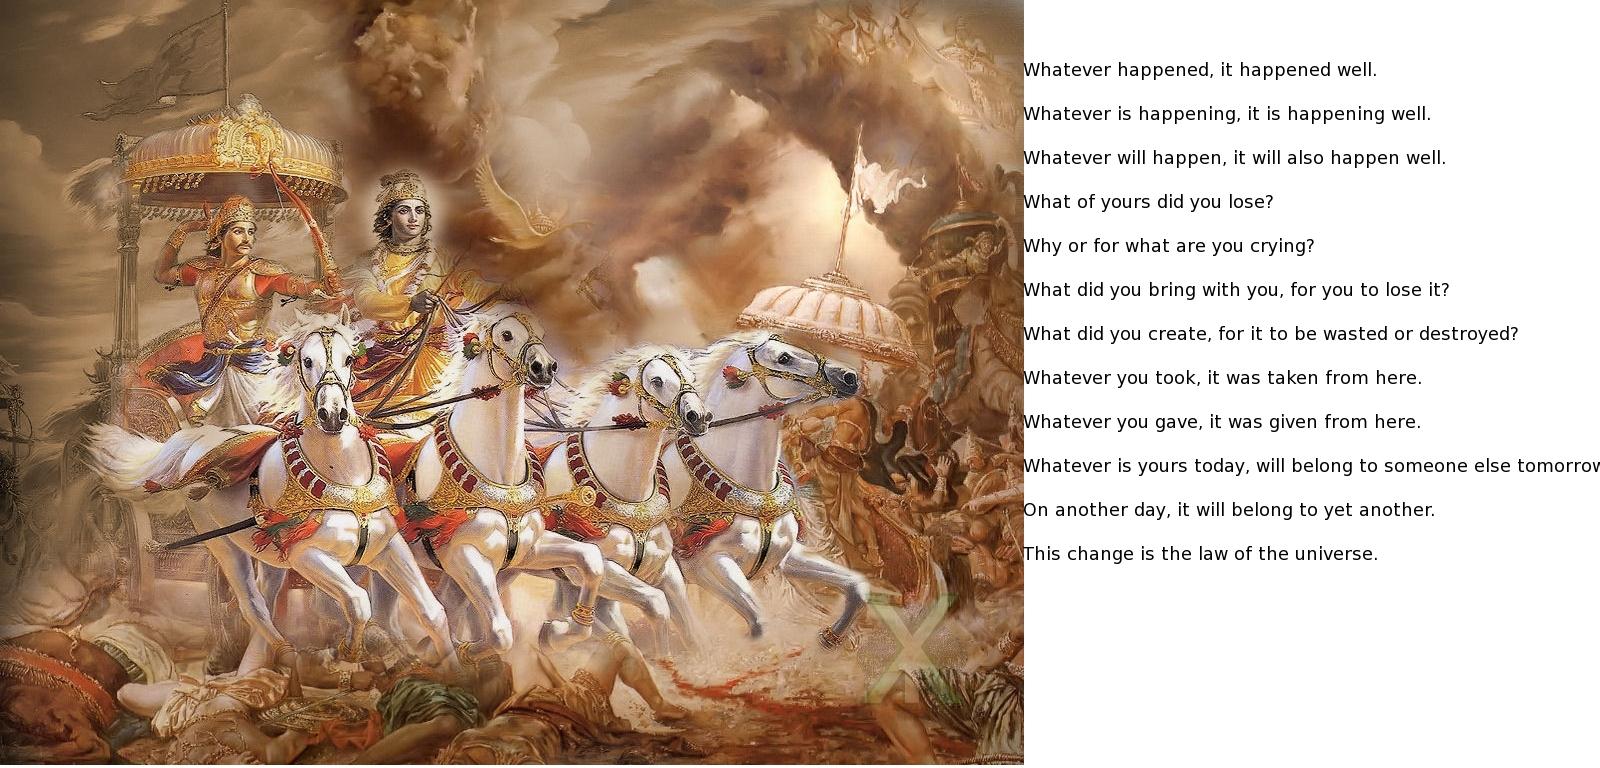 essence of gita in english essence of gita in tamil gurushektra ...